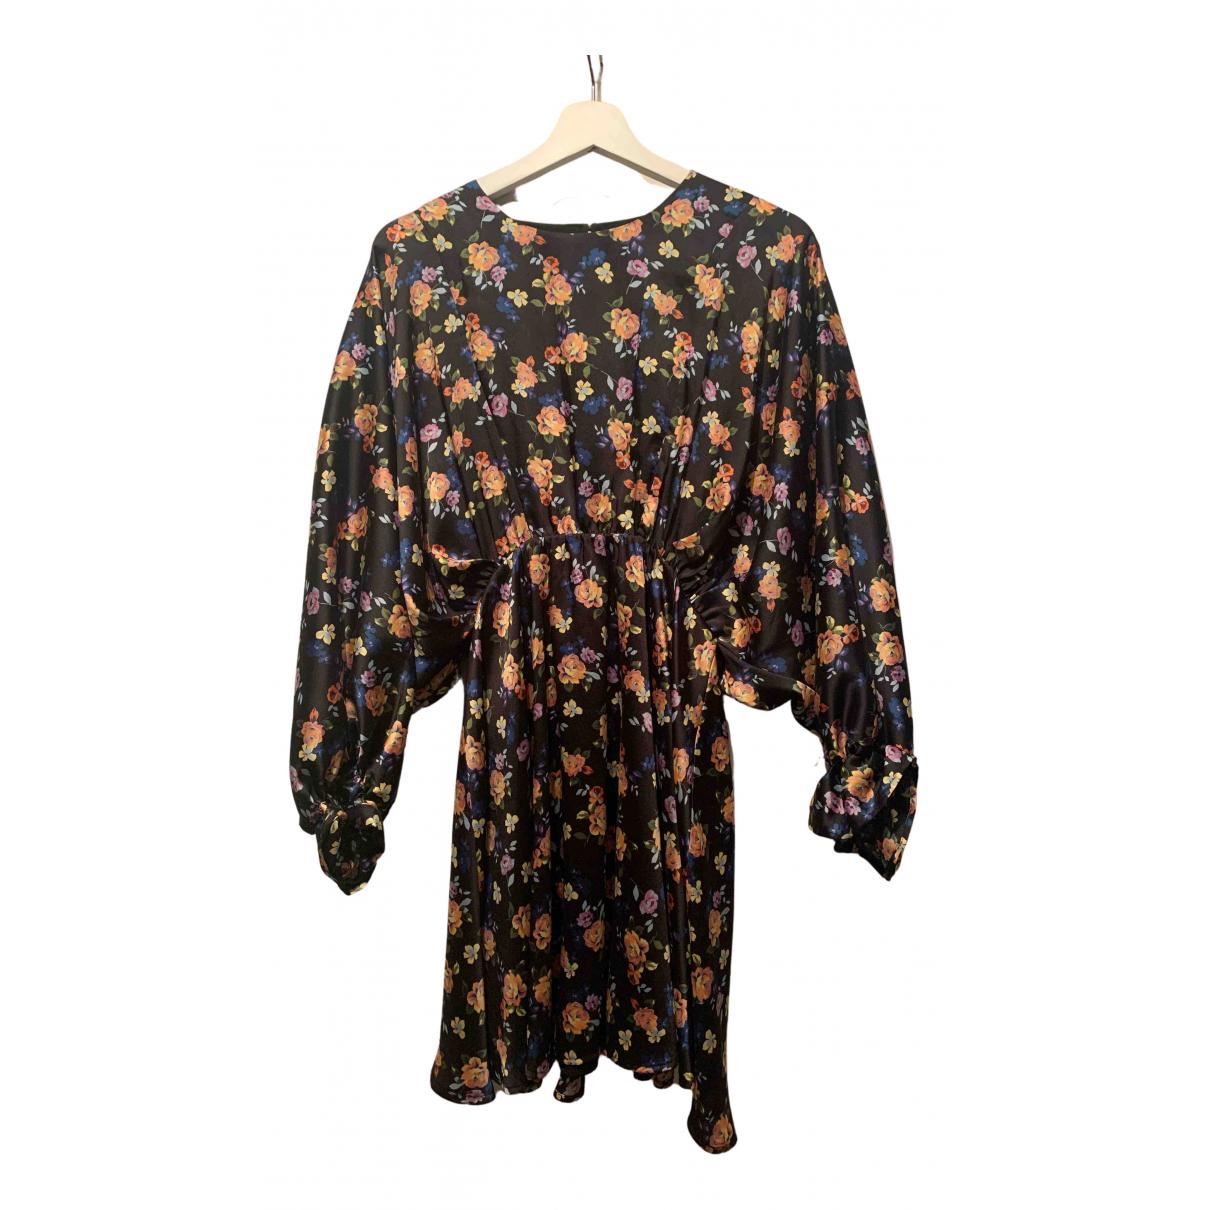 Zara \N Kleid in  Schwarz Kaschmir